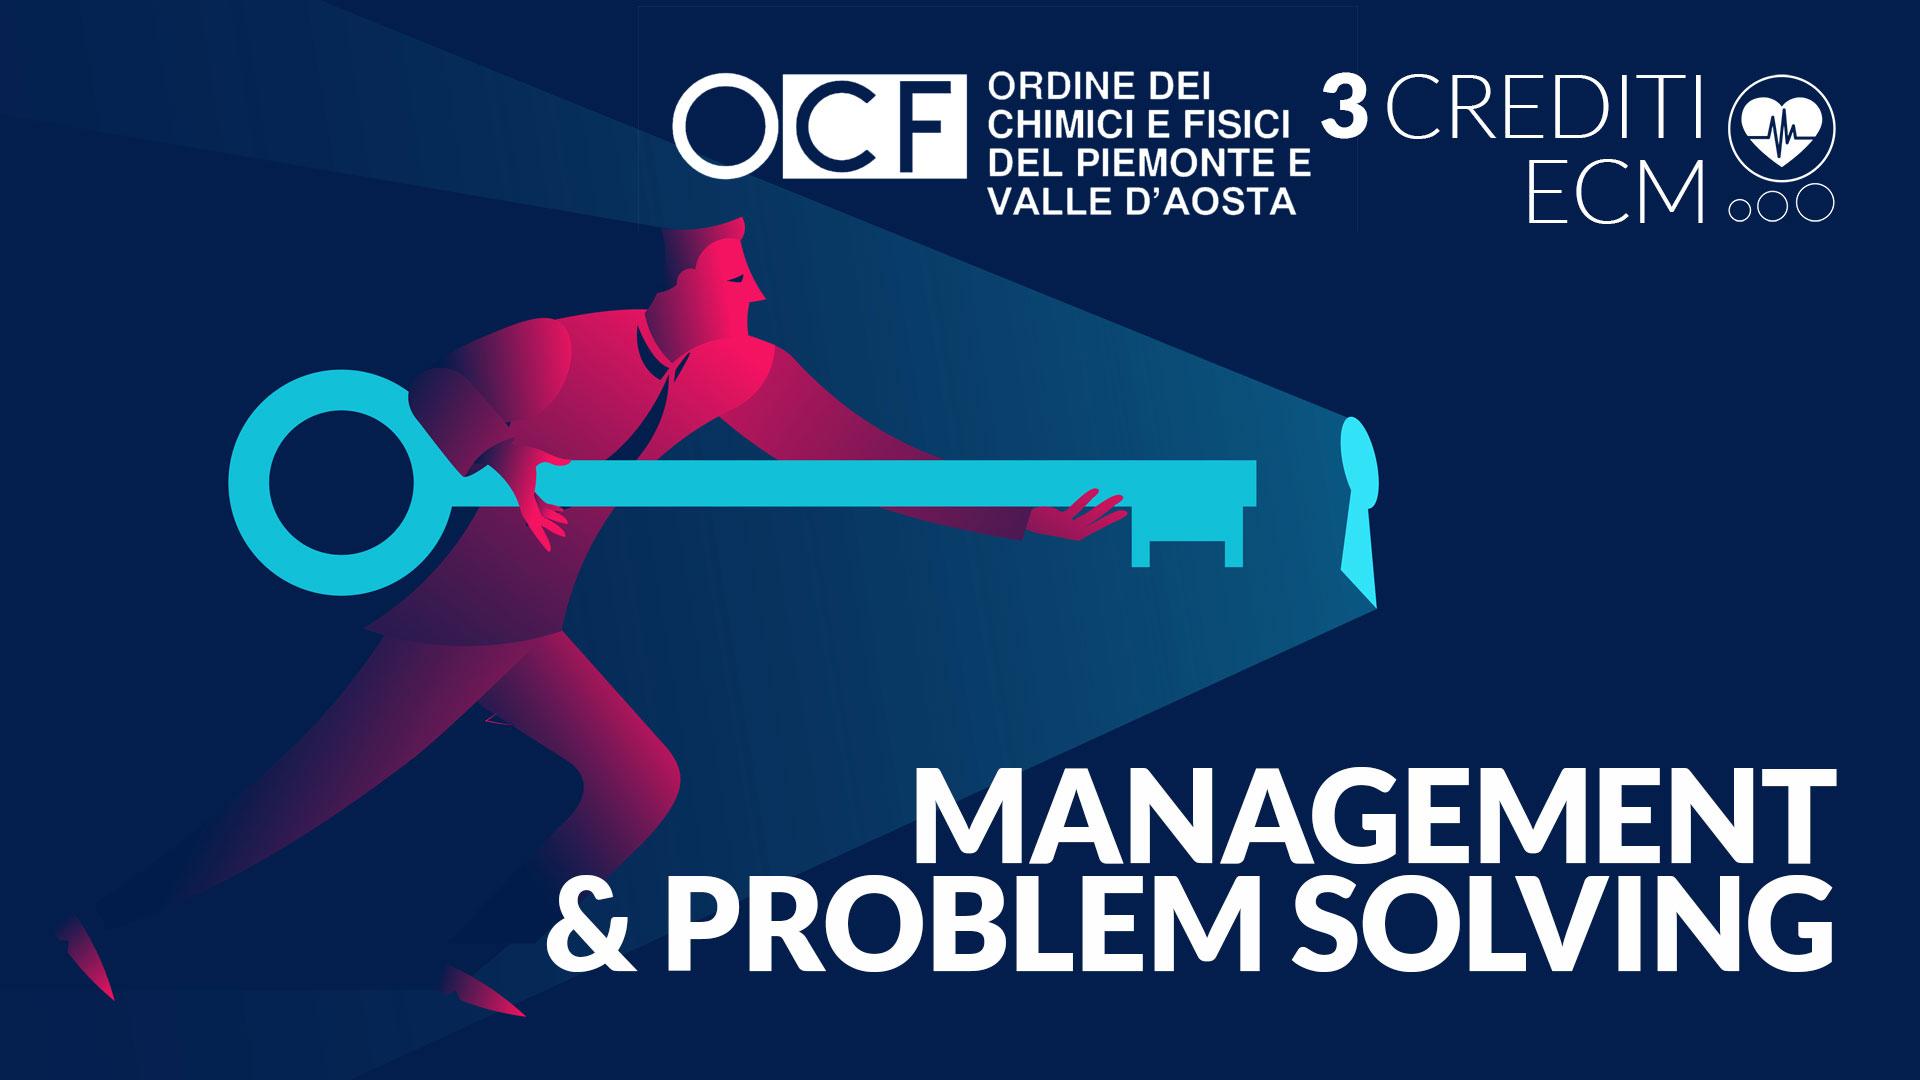 Management & Problem Solving